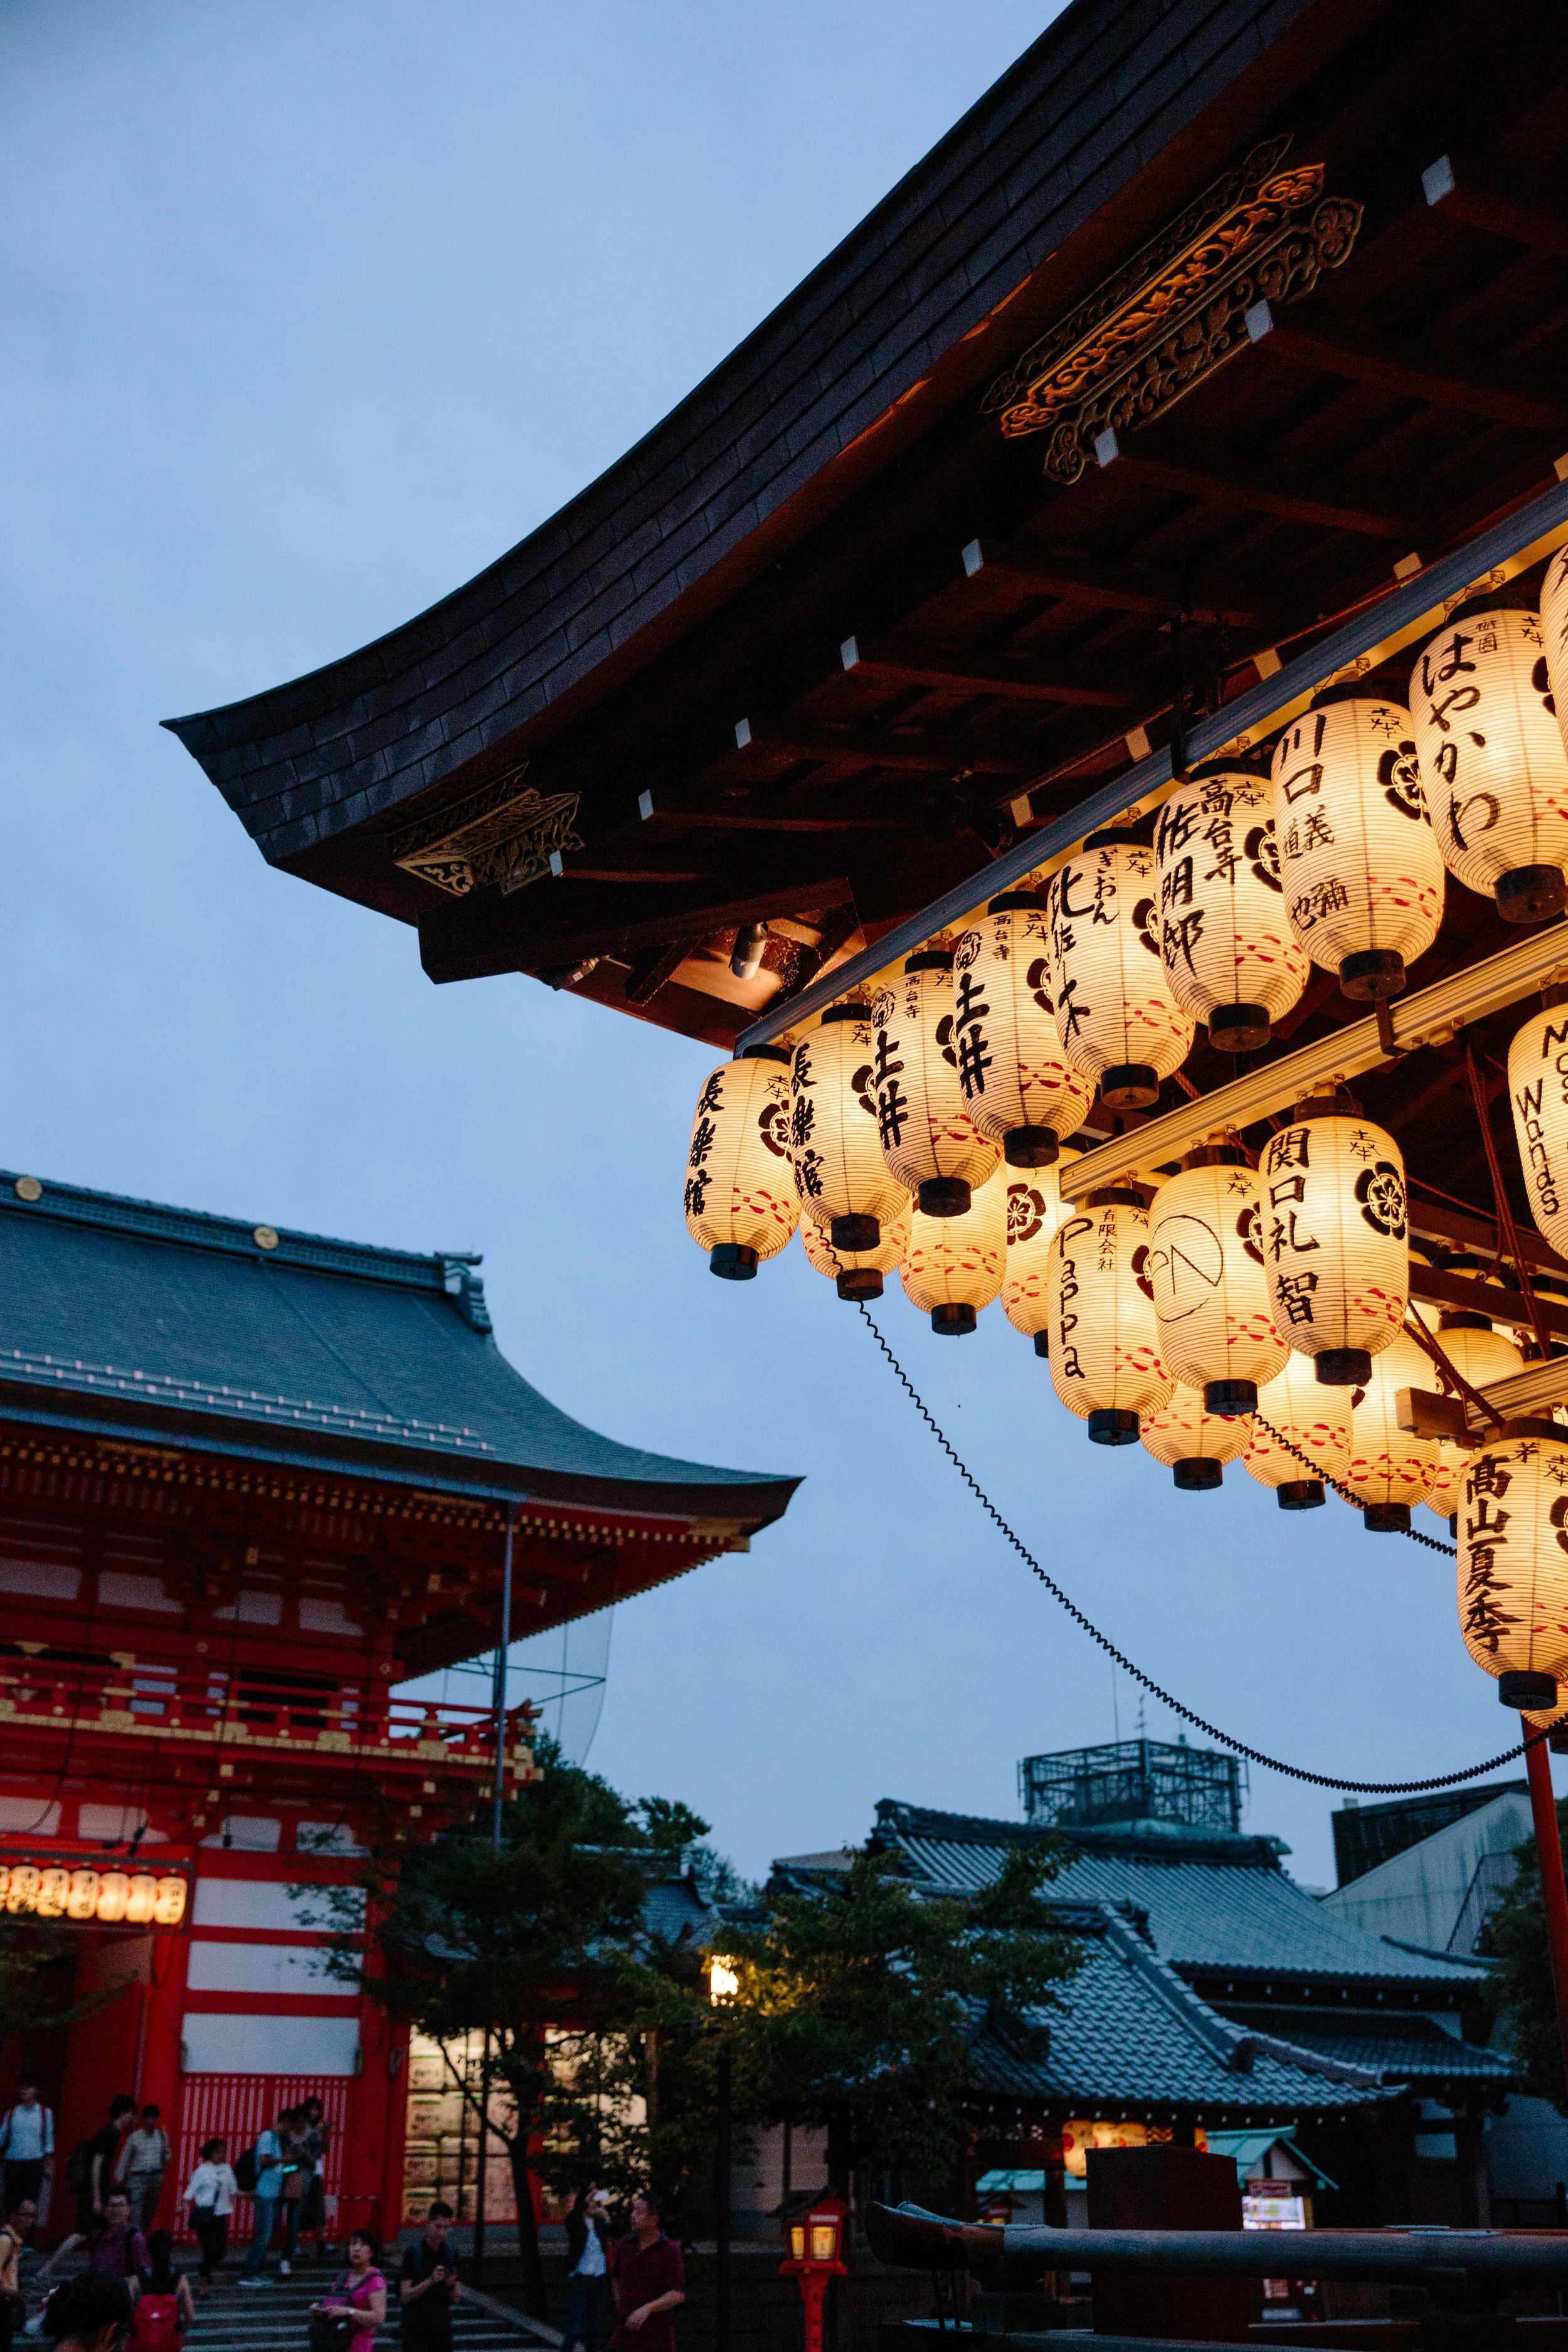 ajwells_japan-0004.jpg